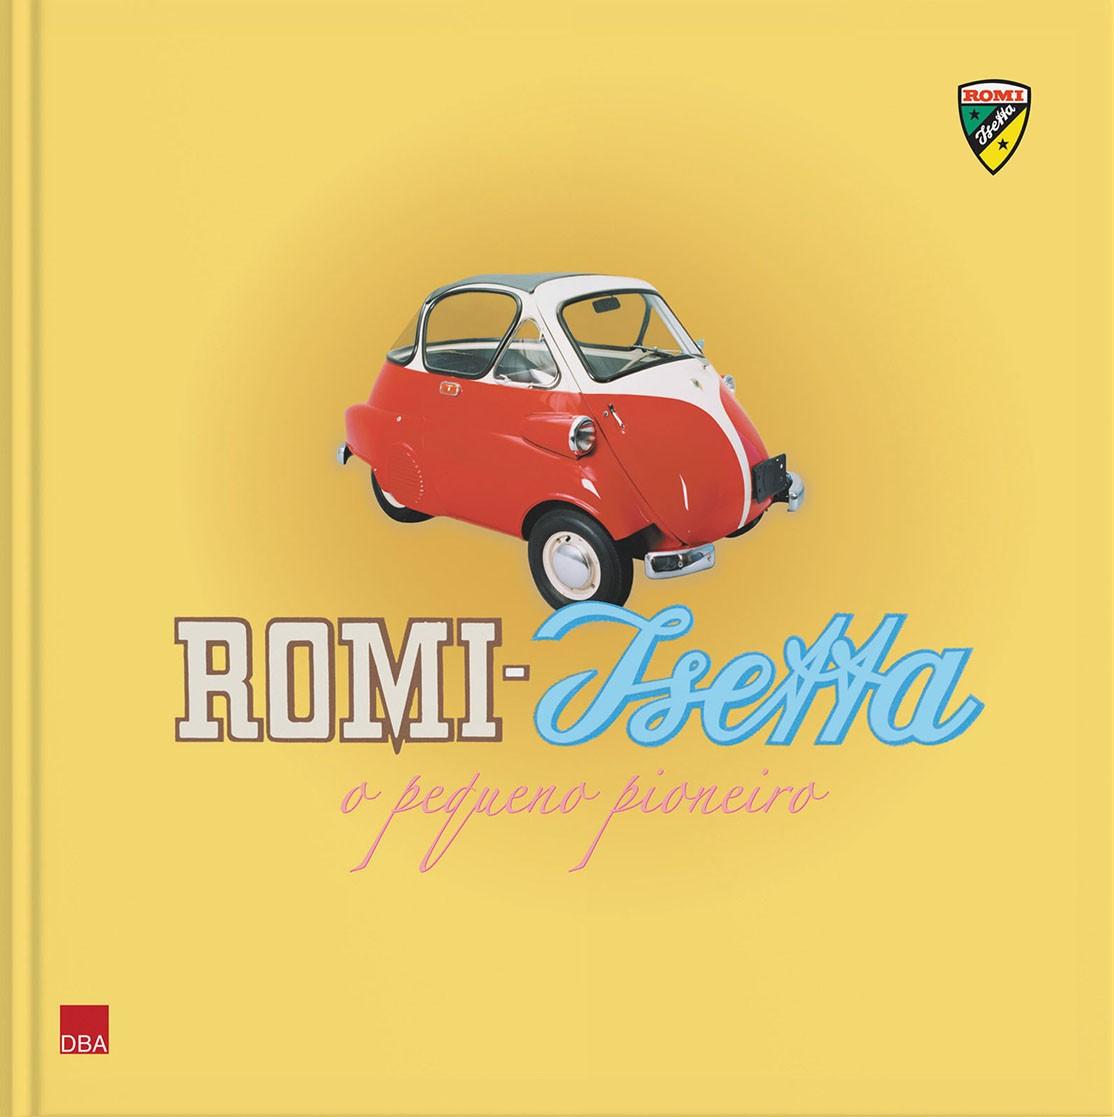 Romi-Isetta, o pequeno pioneiro